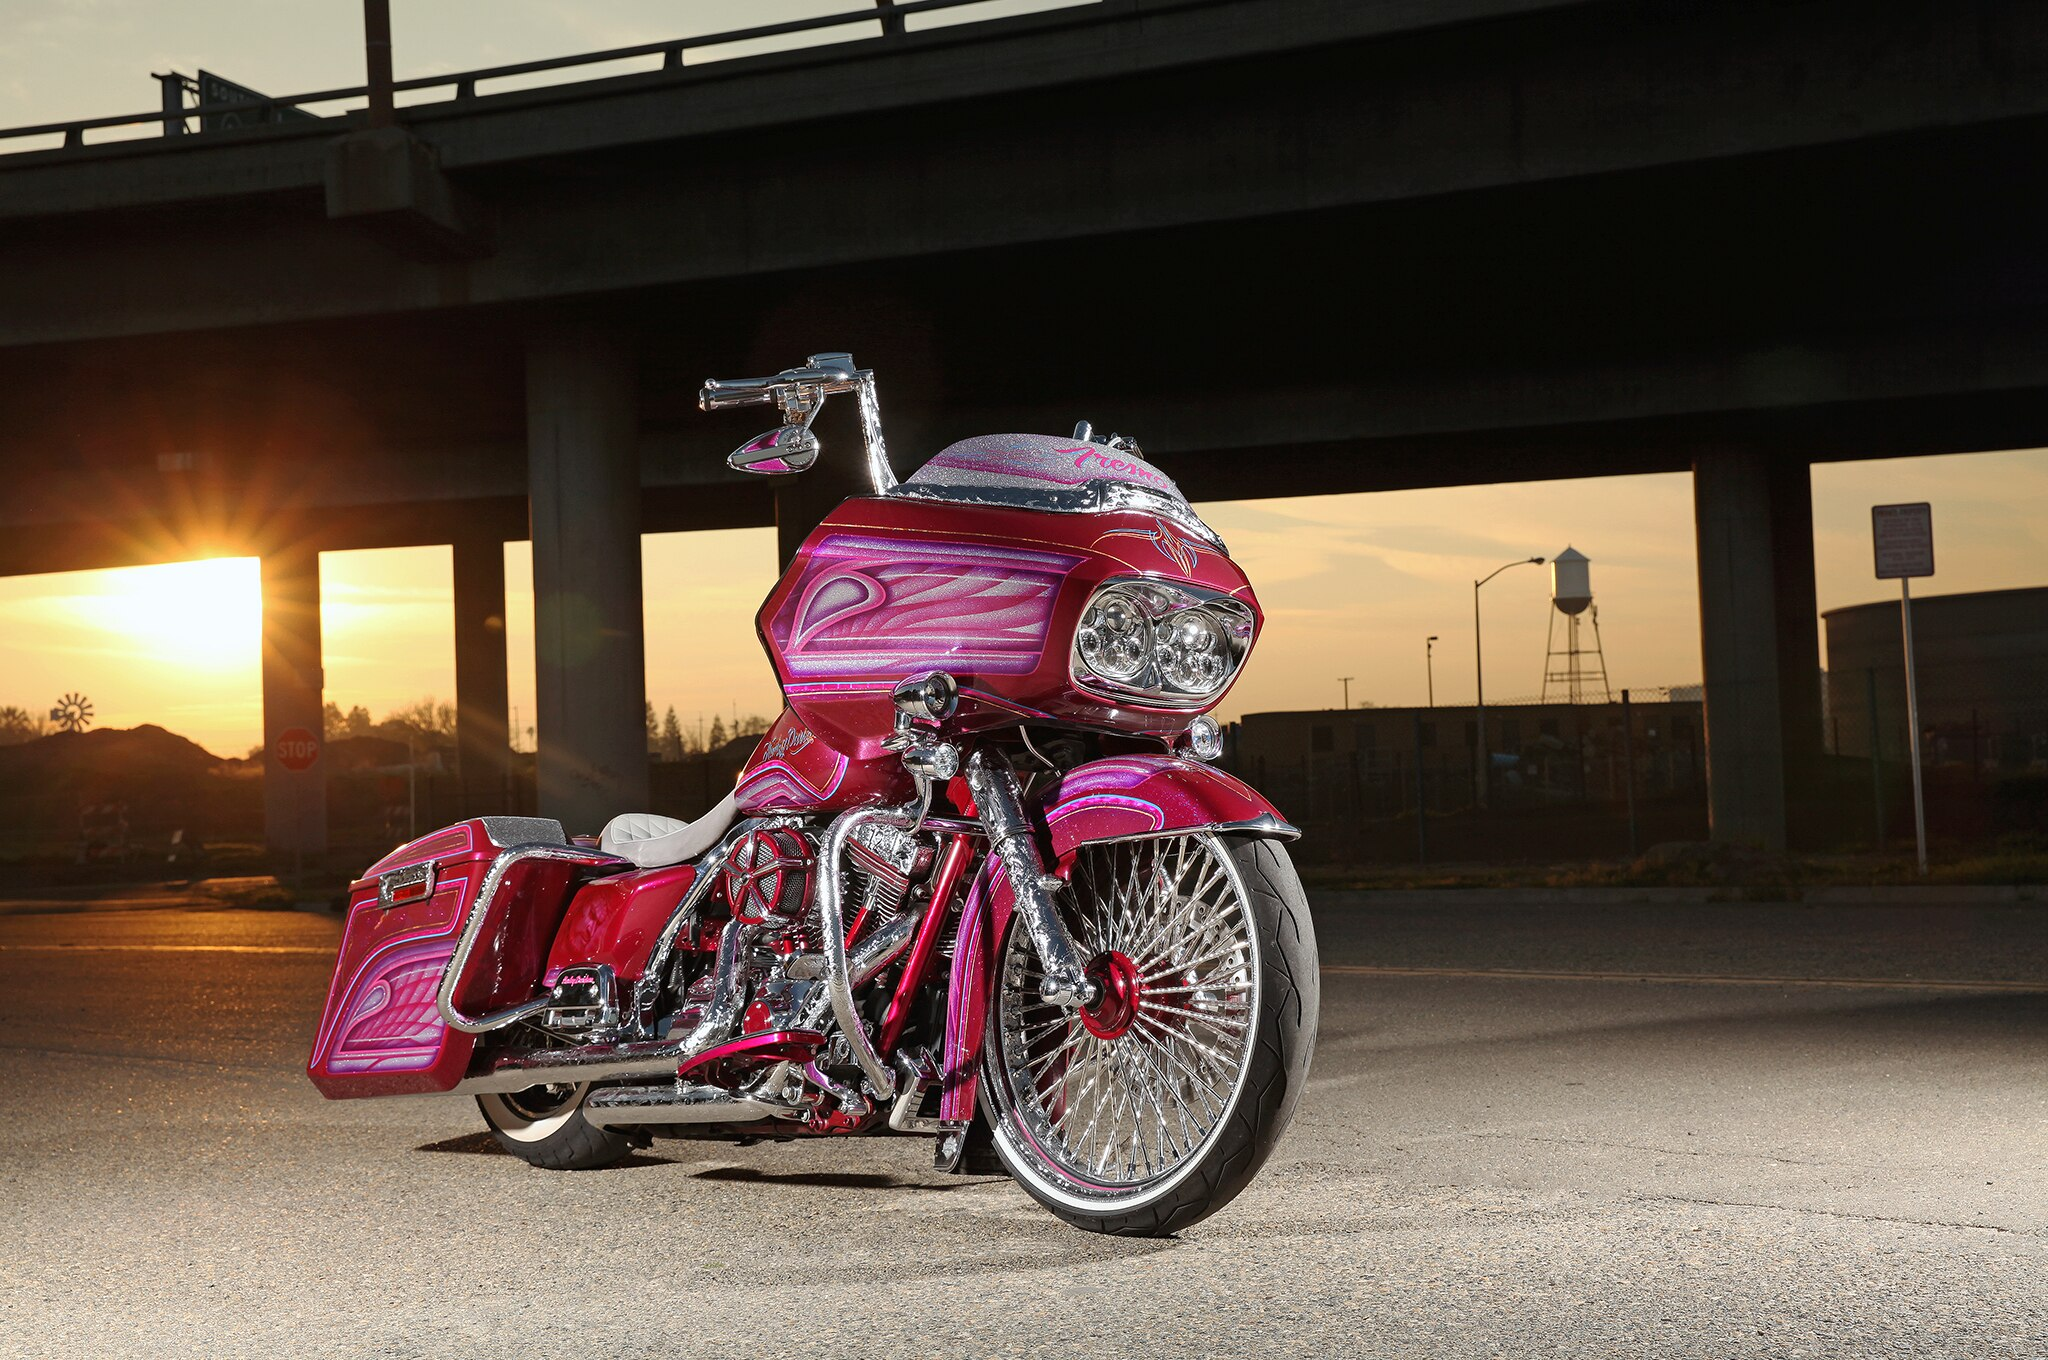 2012 harley davidson road glide - the price of dreams